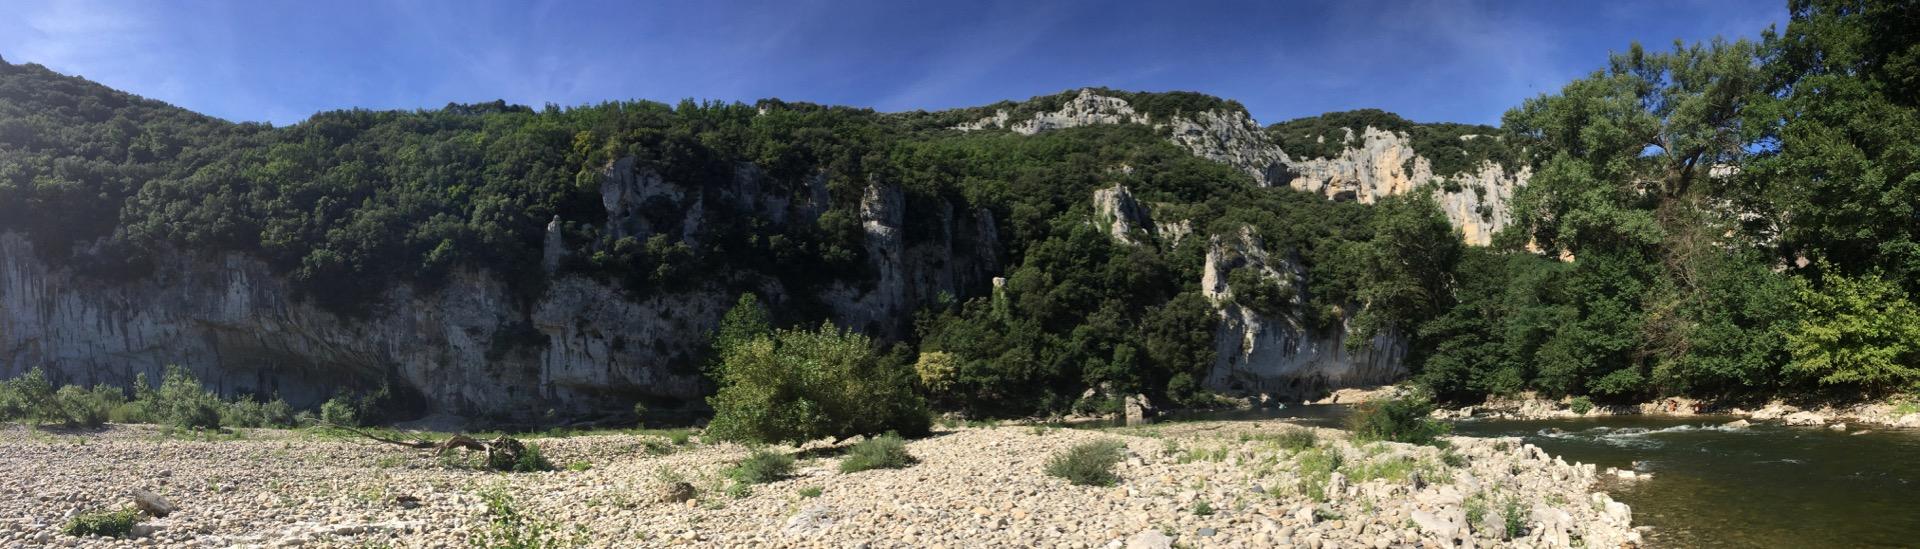 Campingplatz Nature Parc l`Ardechois, Sommer 2016